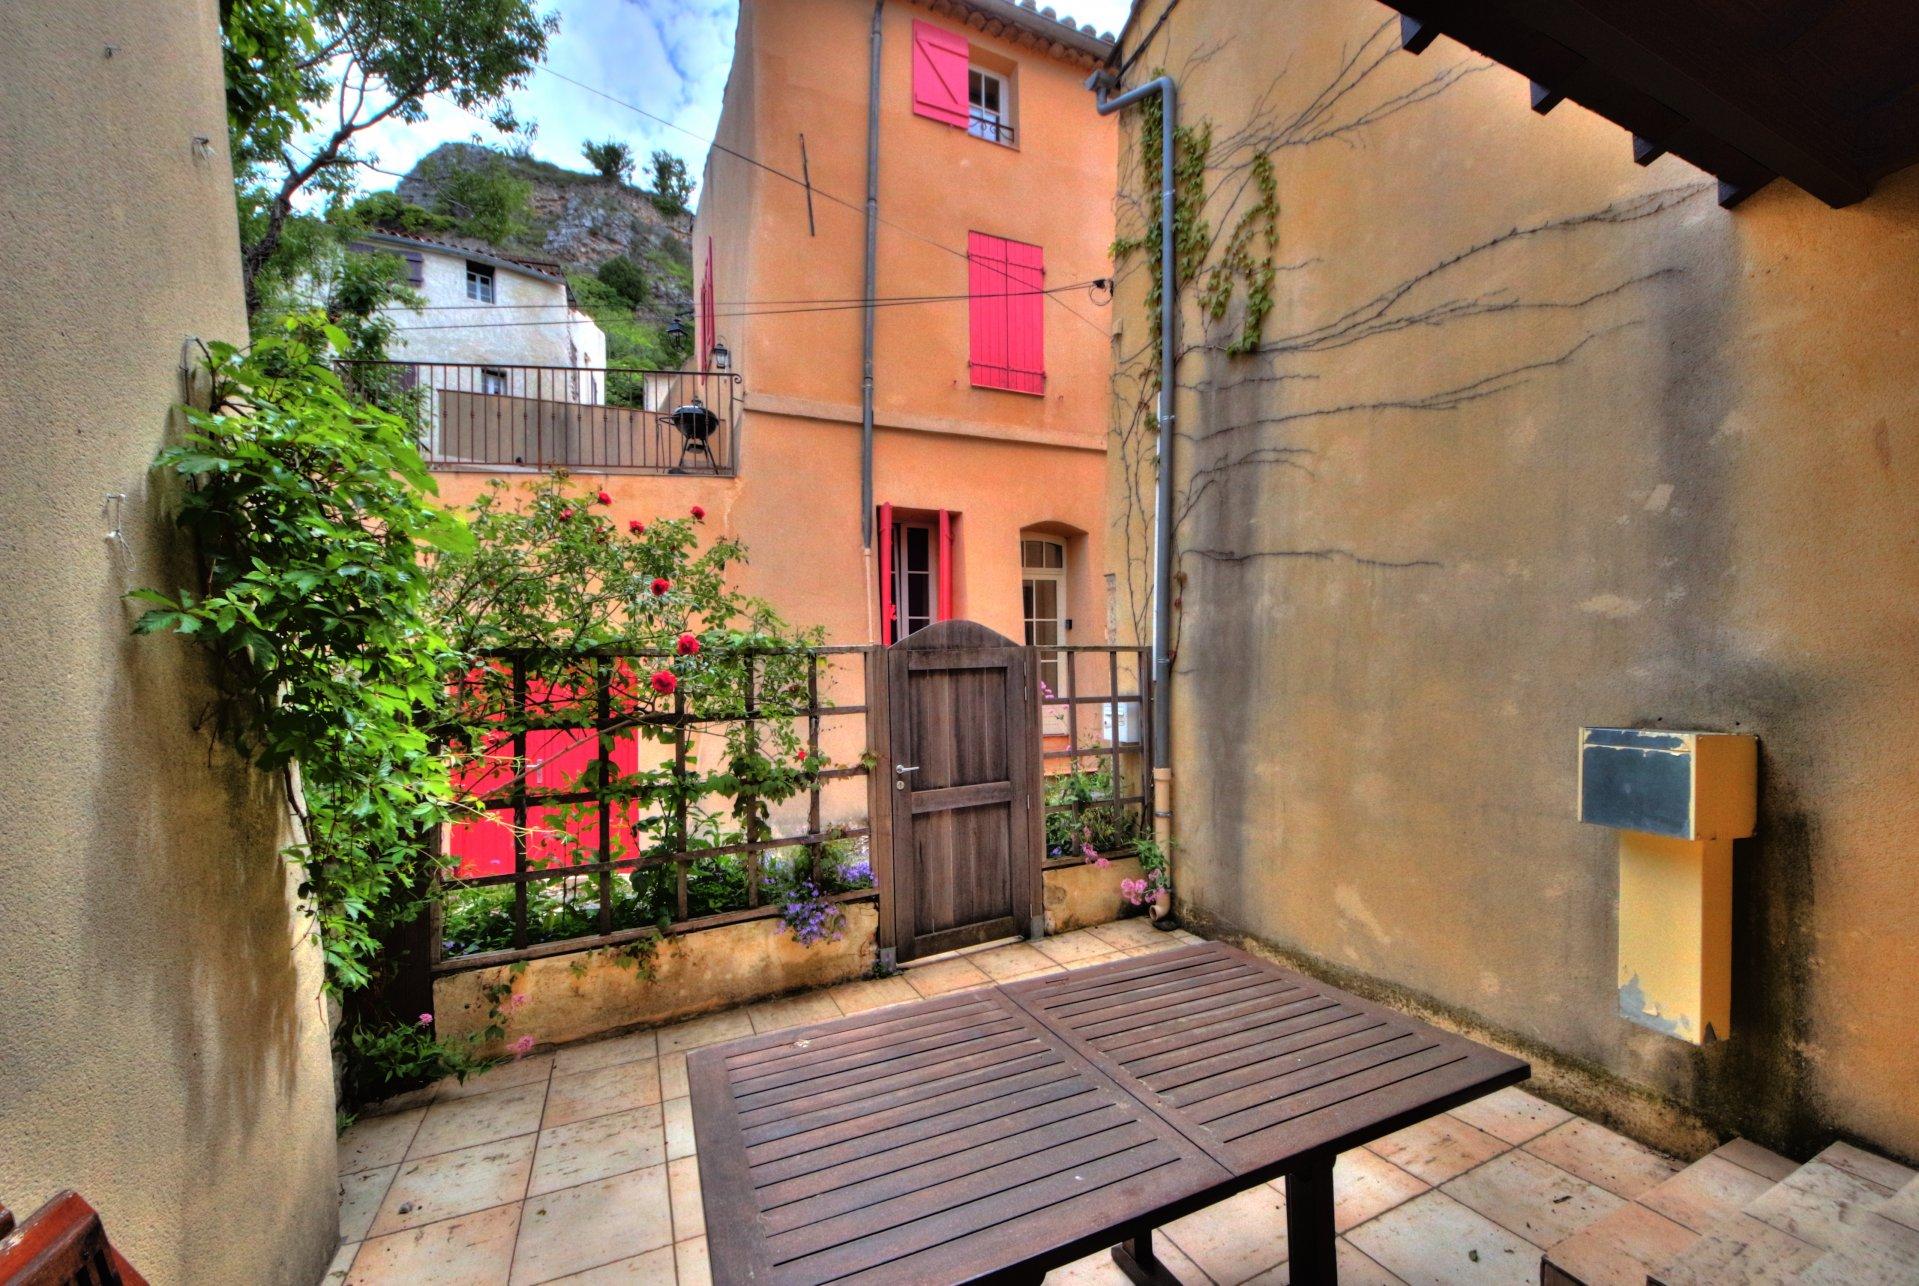 Outdoor court, overlooking the village of Aiguines, bedroom access